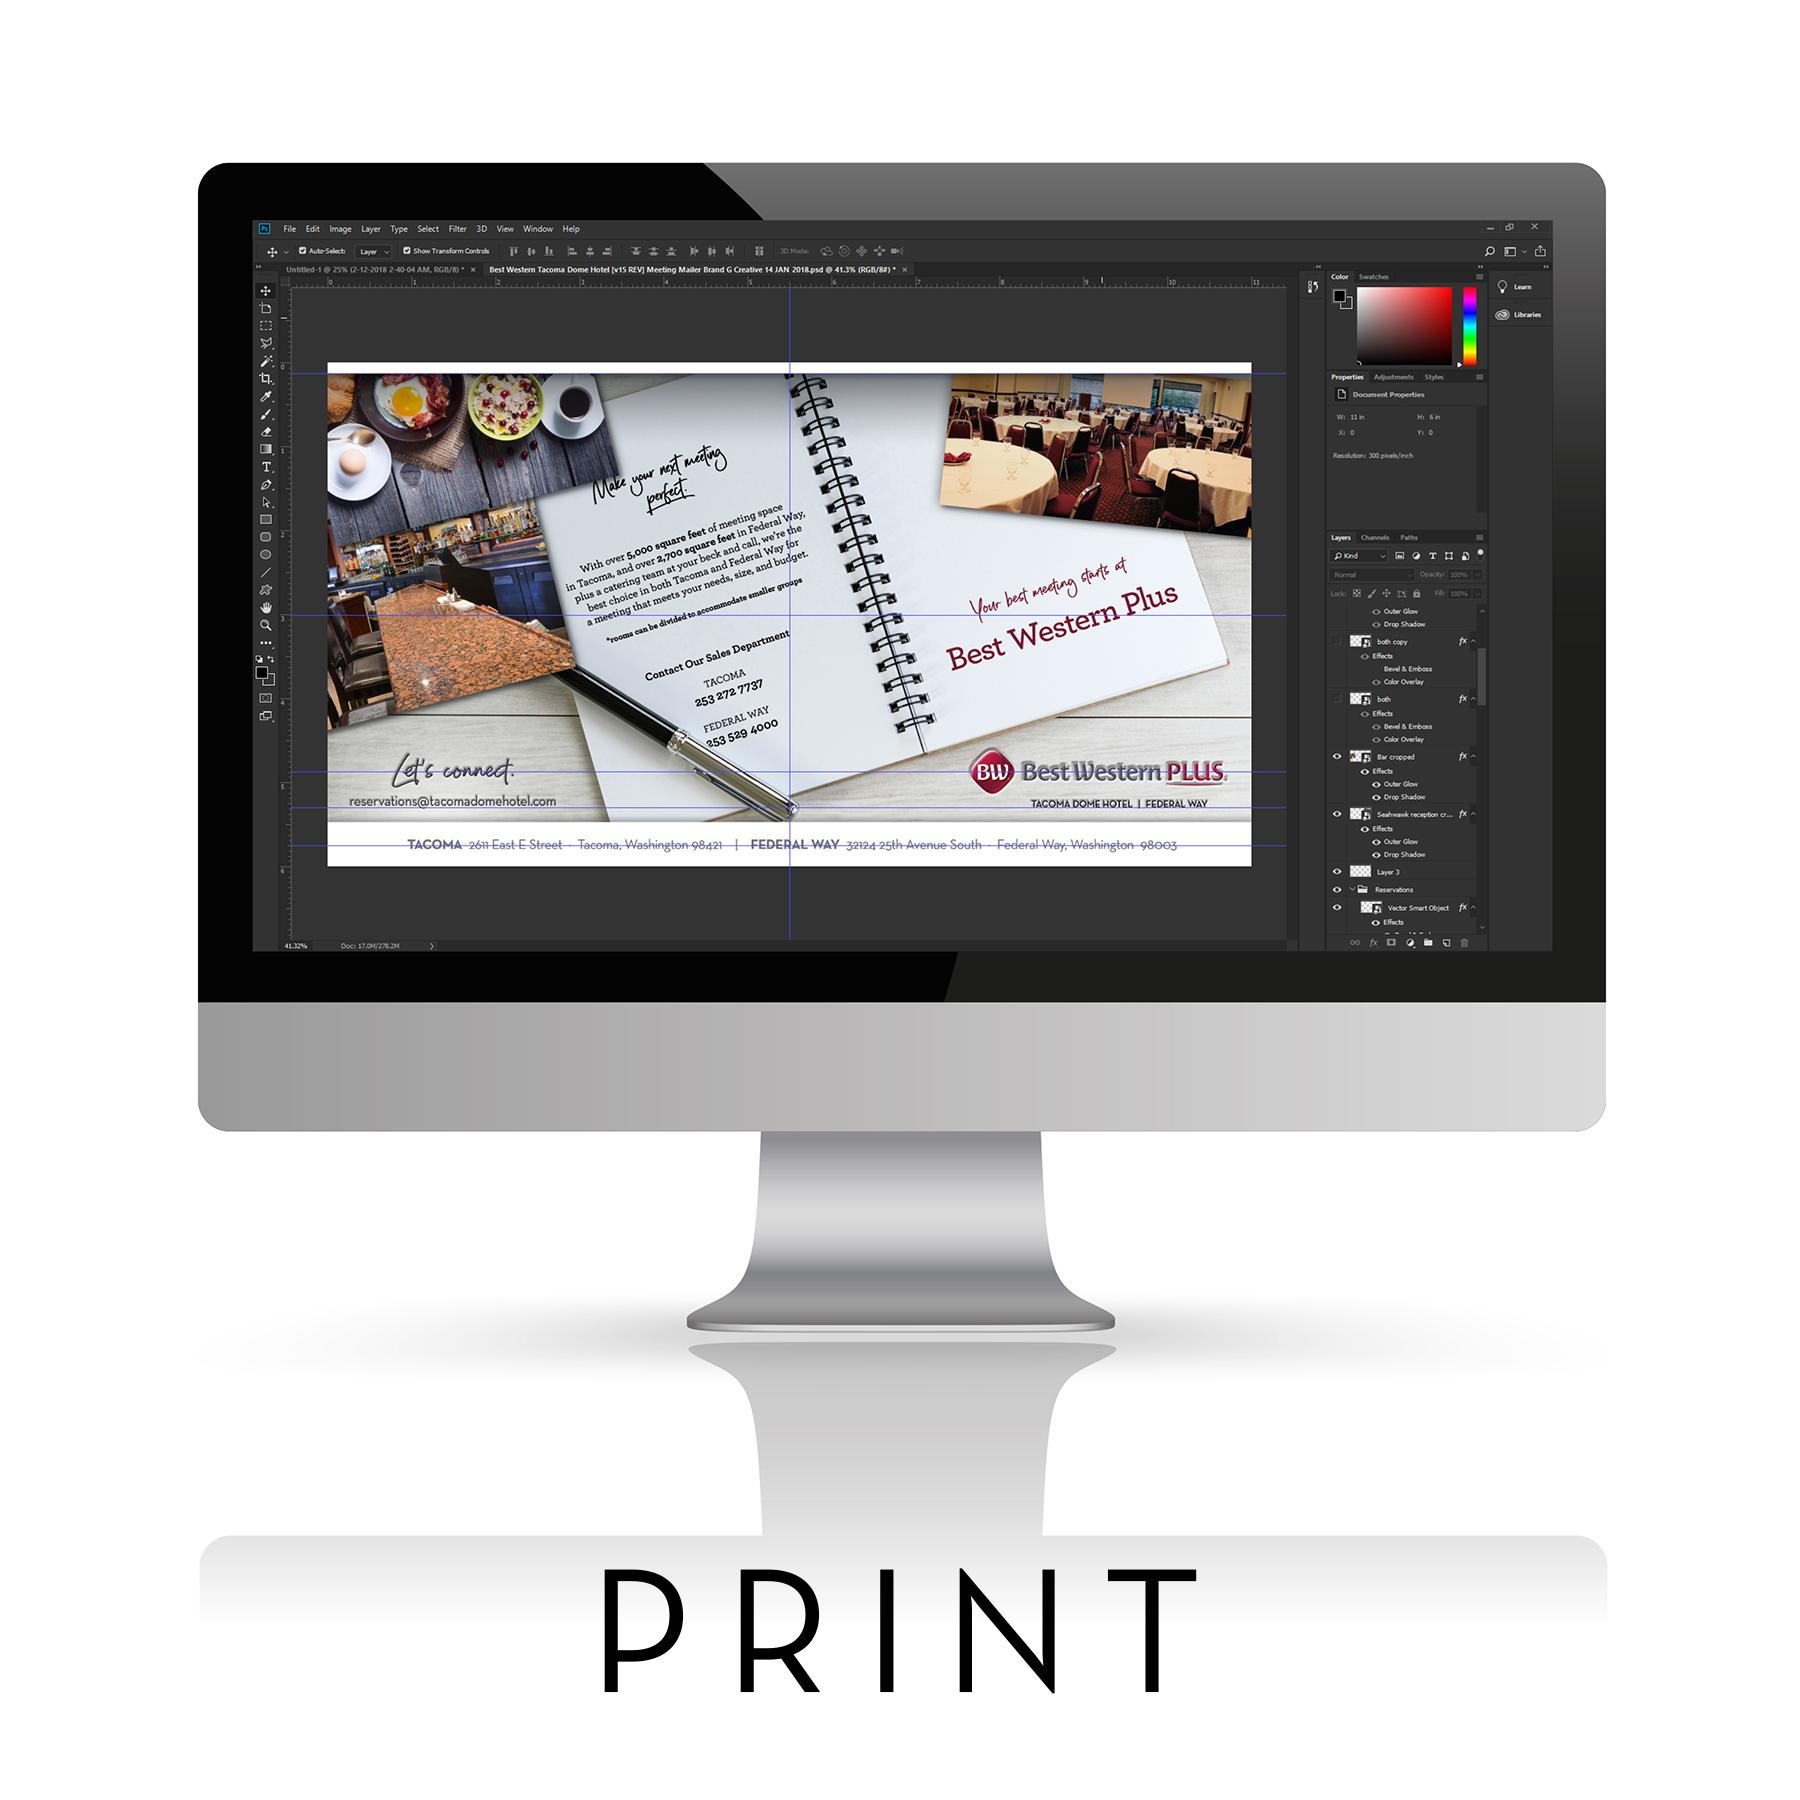 Premium Quality Print Brochures Printing Ad Advertising Disply Promotions by Brand G Creative Seattle Portland San Diego San Francisco Los Angeles Las Vegas Salt Lake City Custom Rush